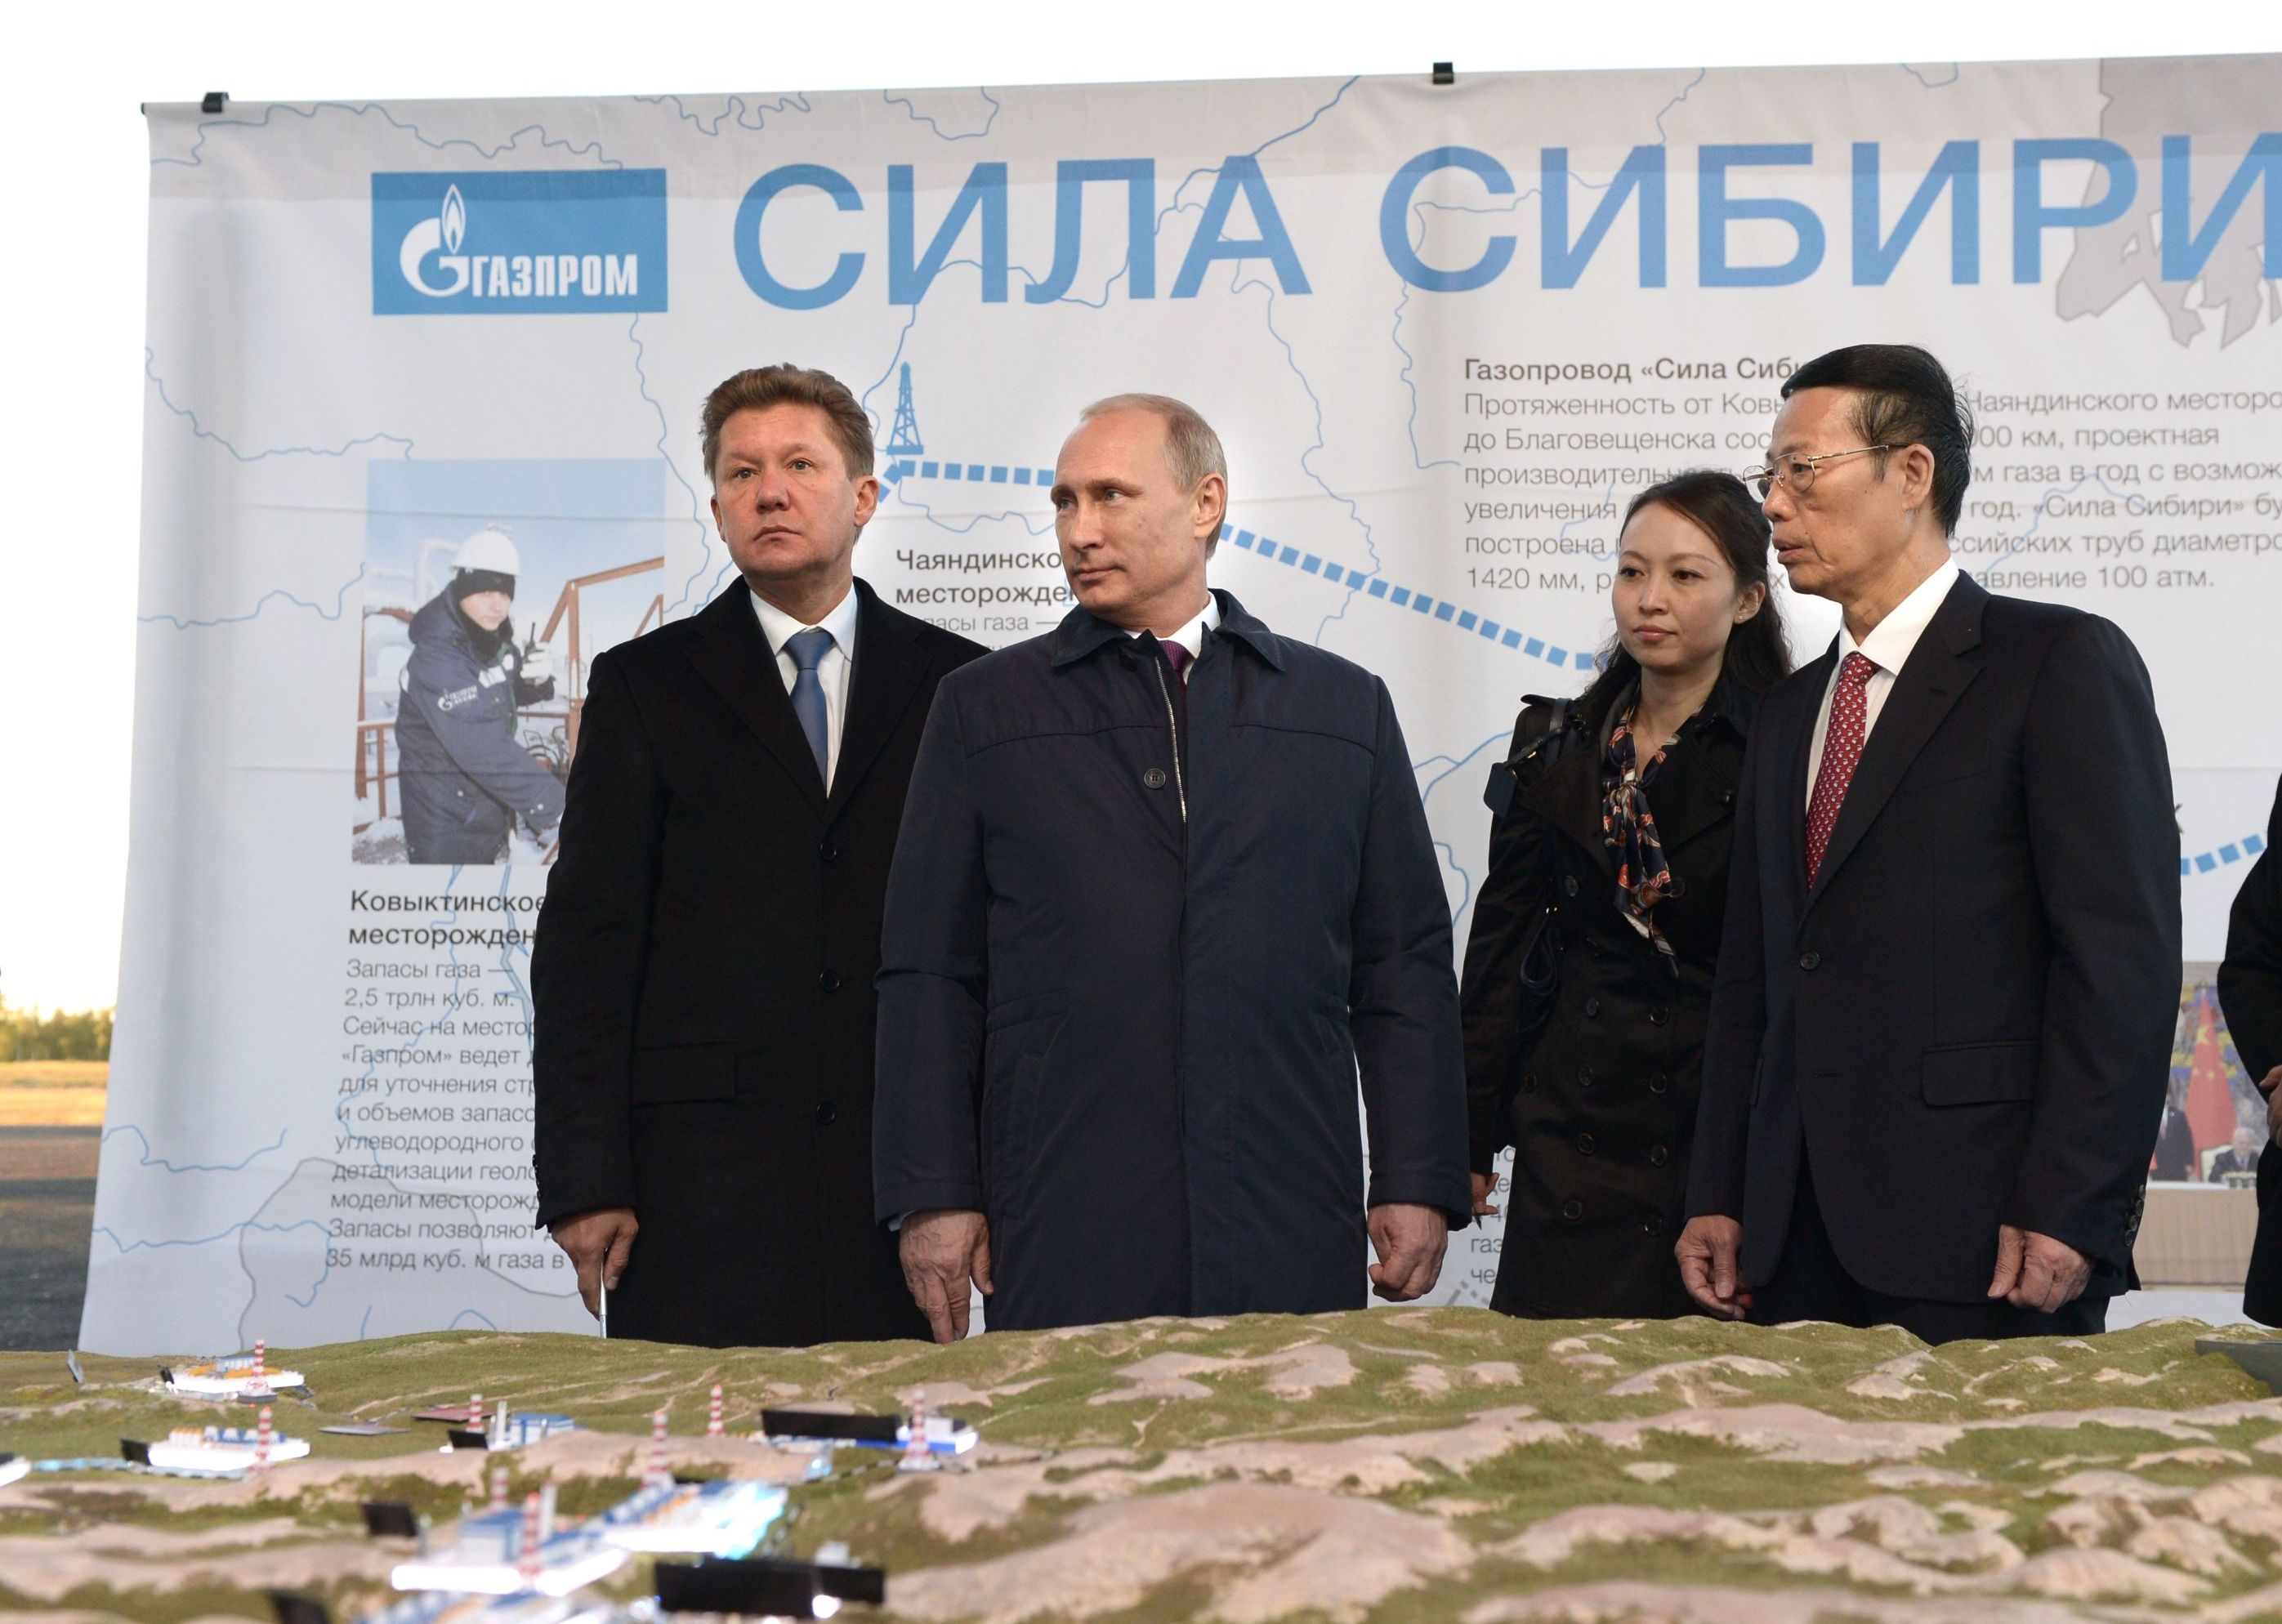 Visit of Vladimir Putin to the Far Eastern Federal District, 1 September 2014